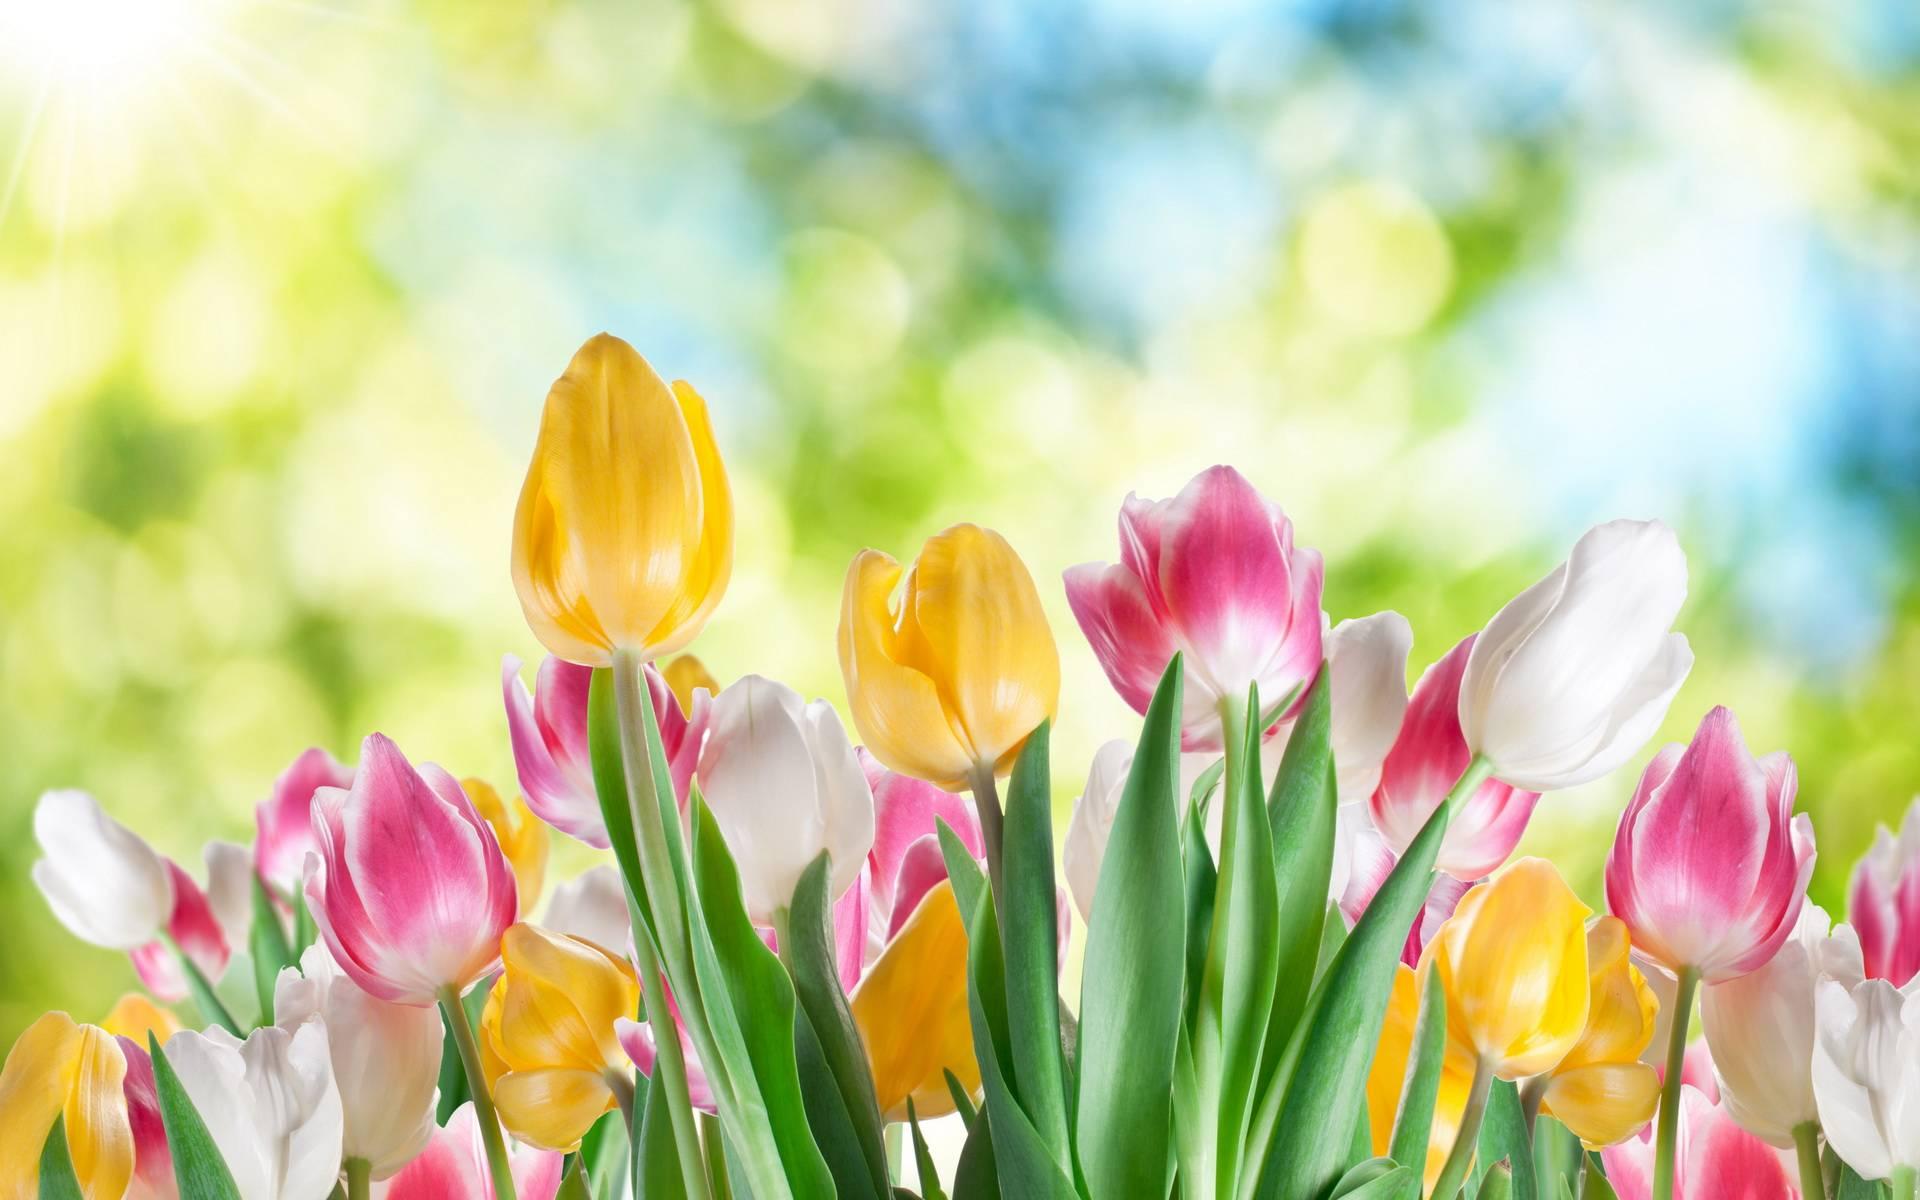 beautiful tulips images